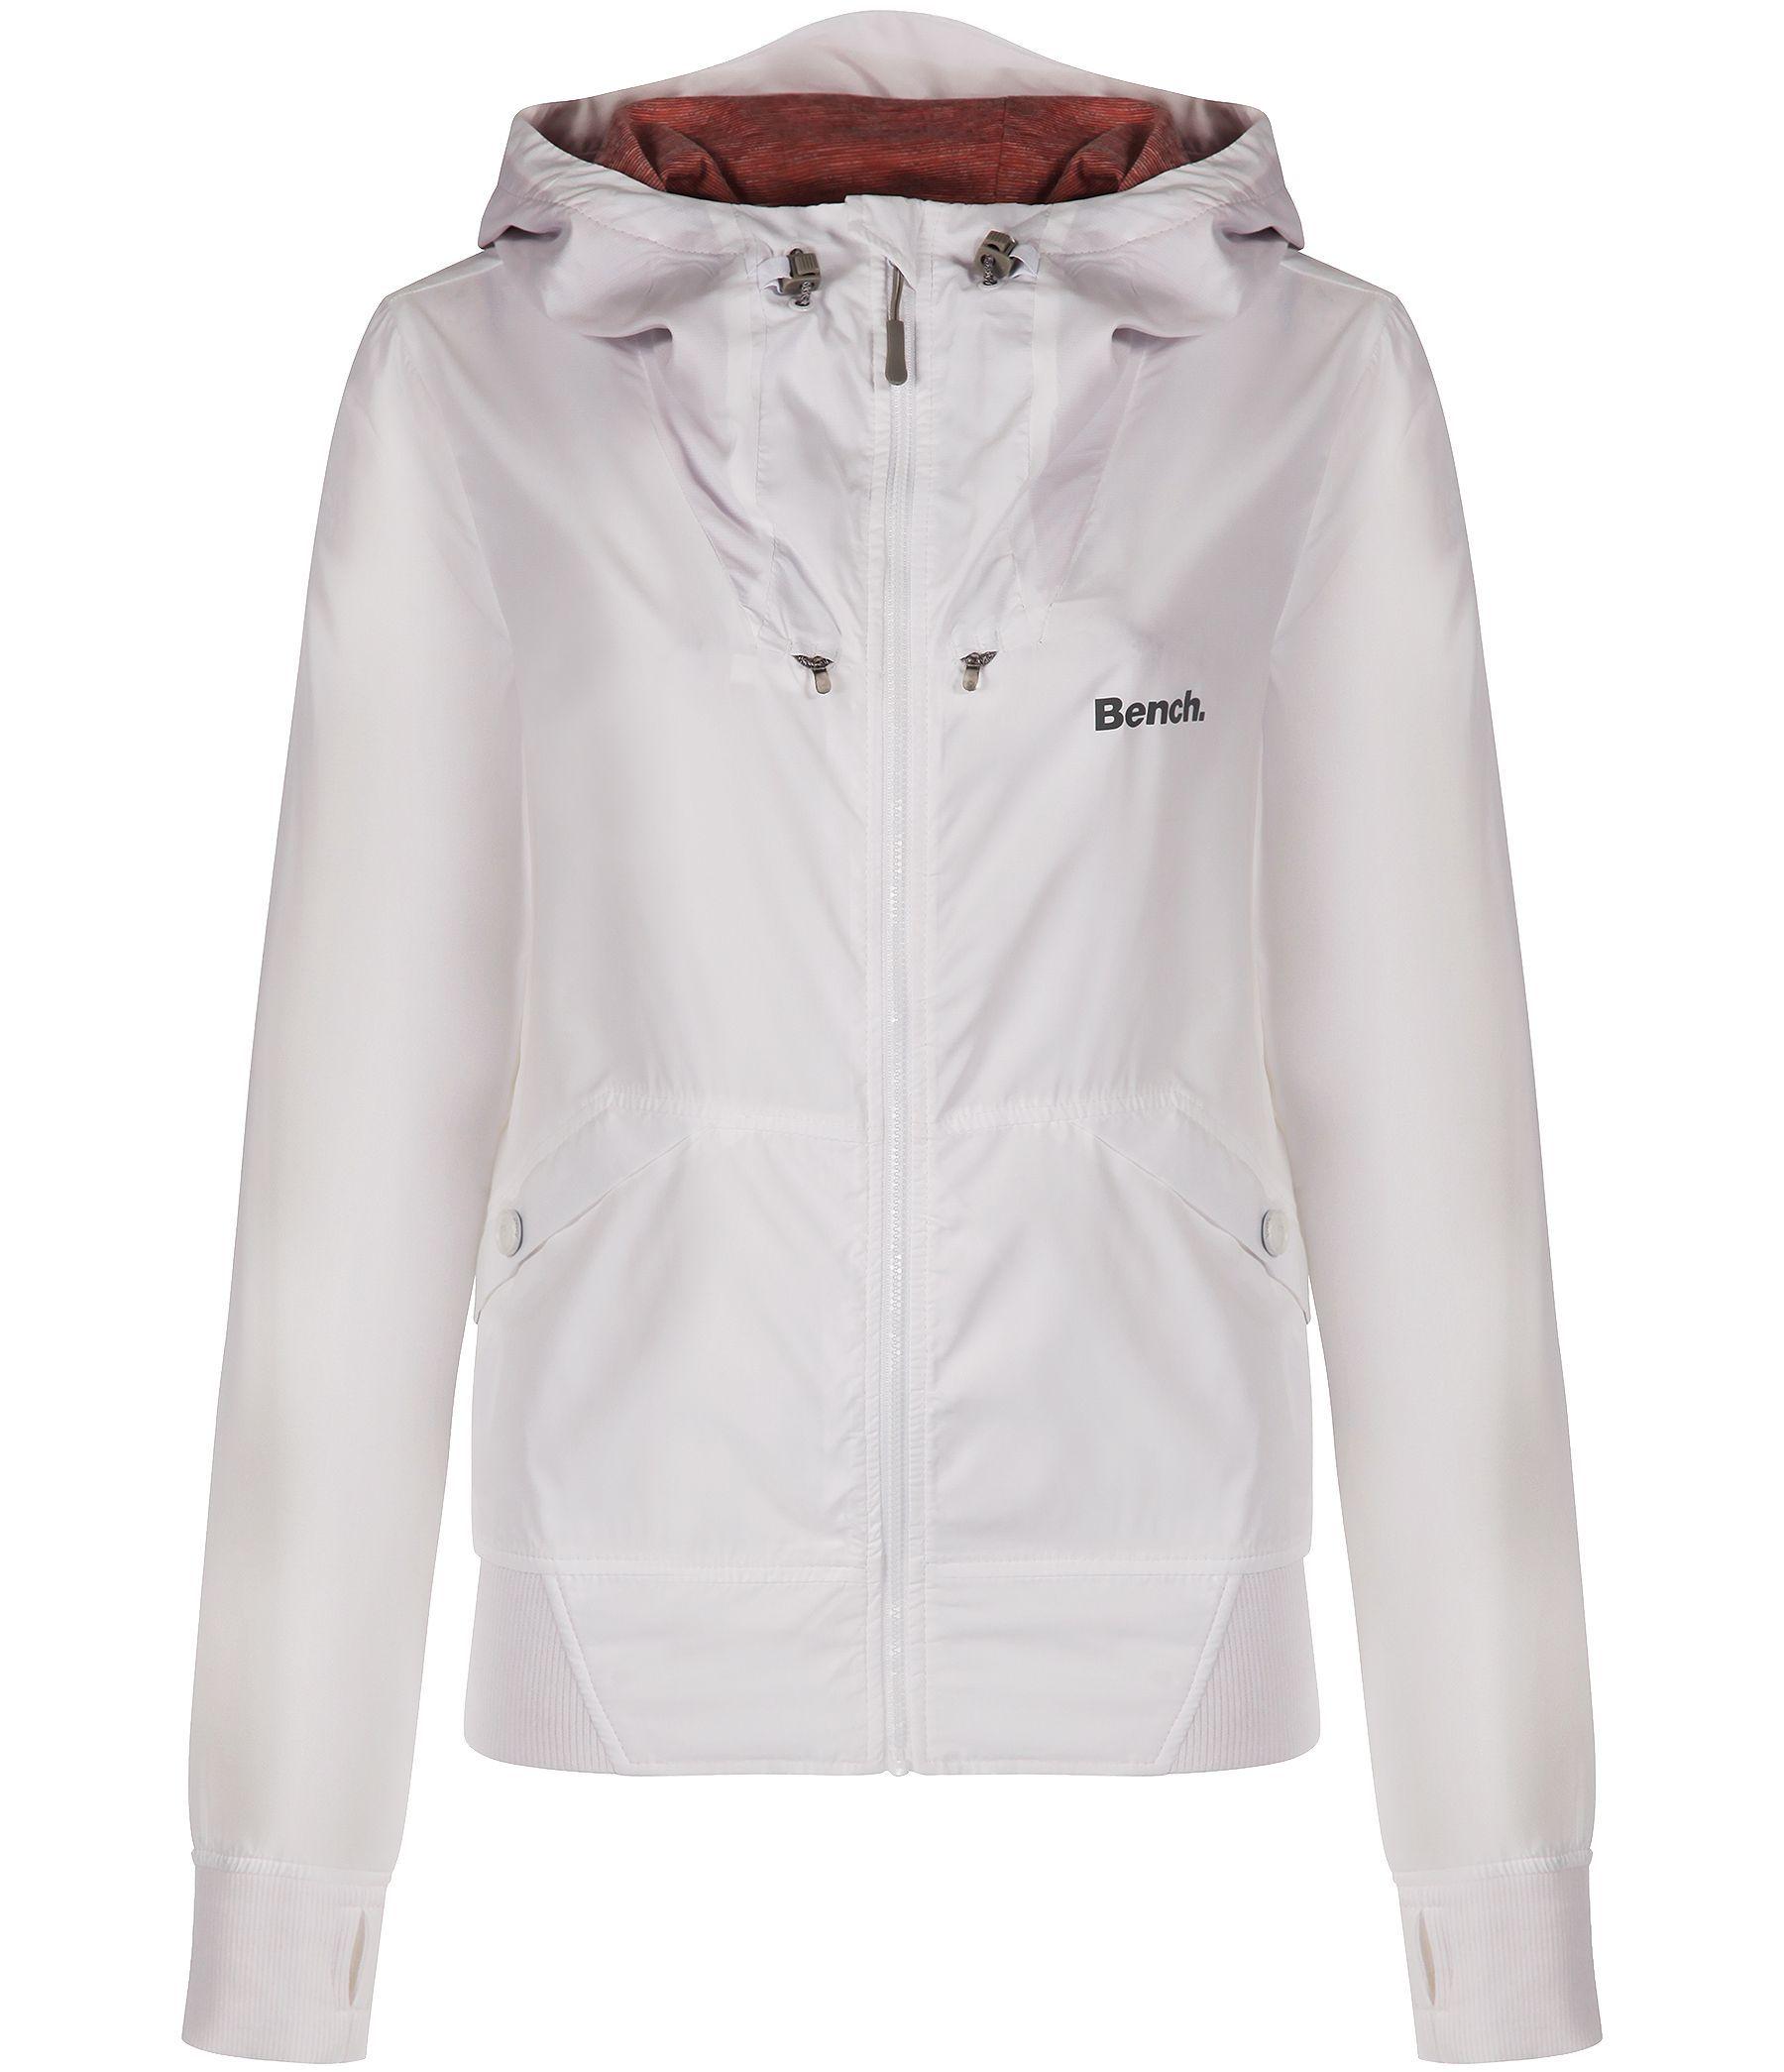 Bench onetimer ii b lightweight shell jacket in white lyst Bench jacket